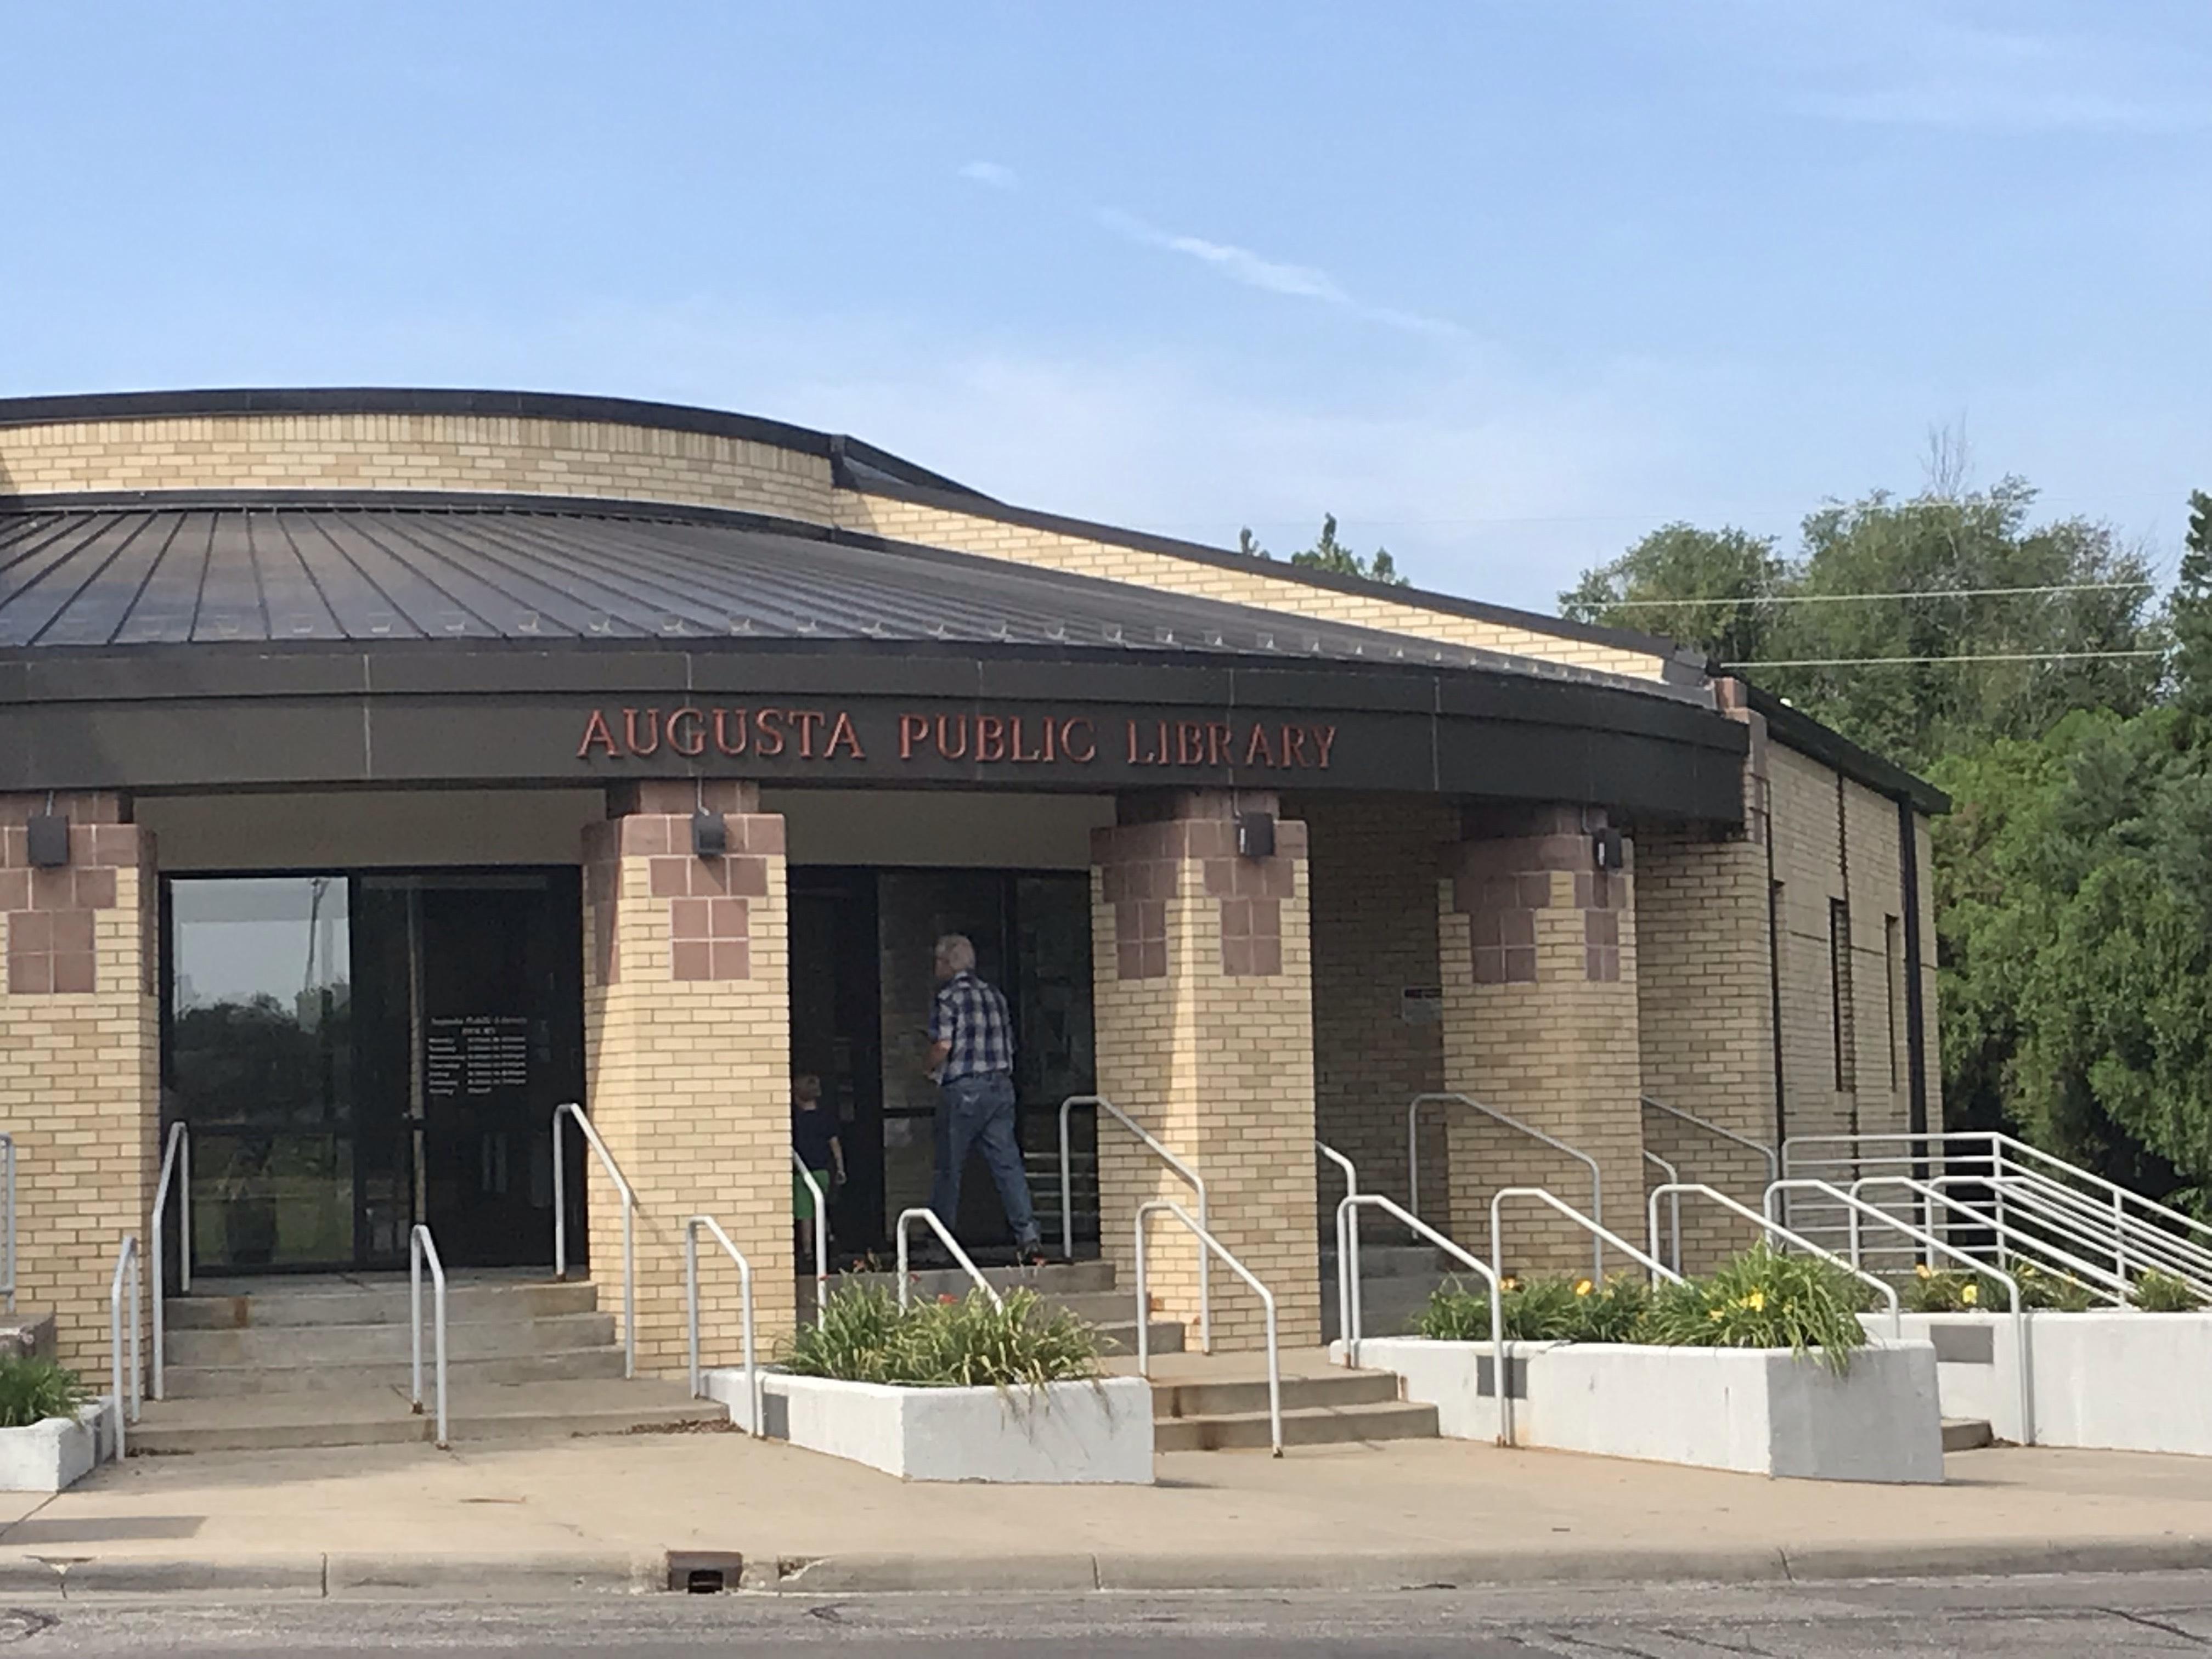 Augusta Public Library